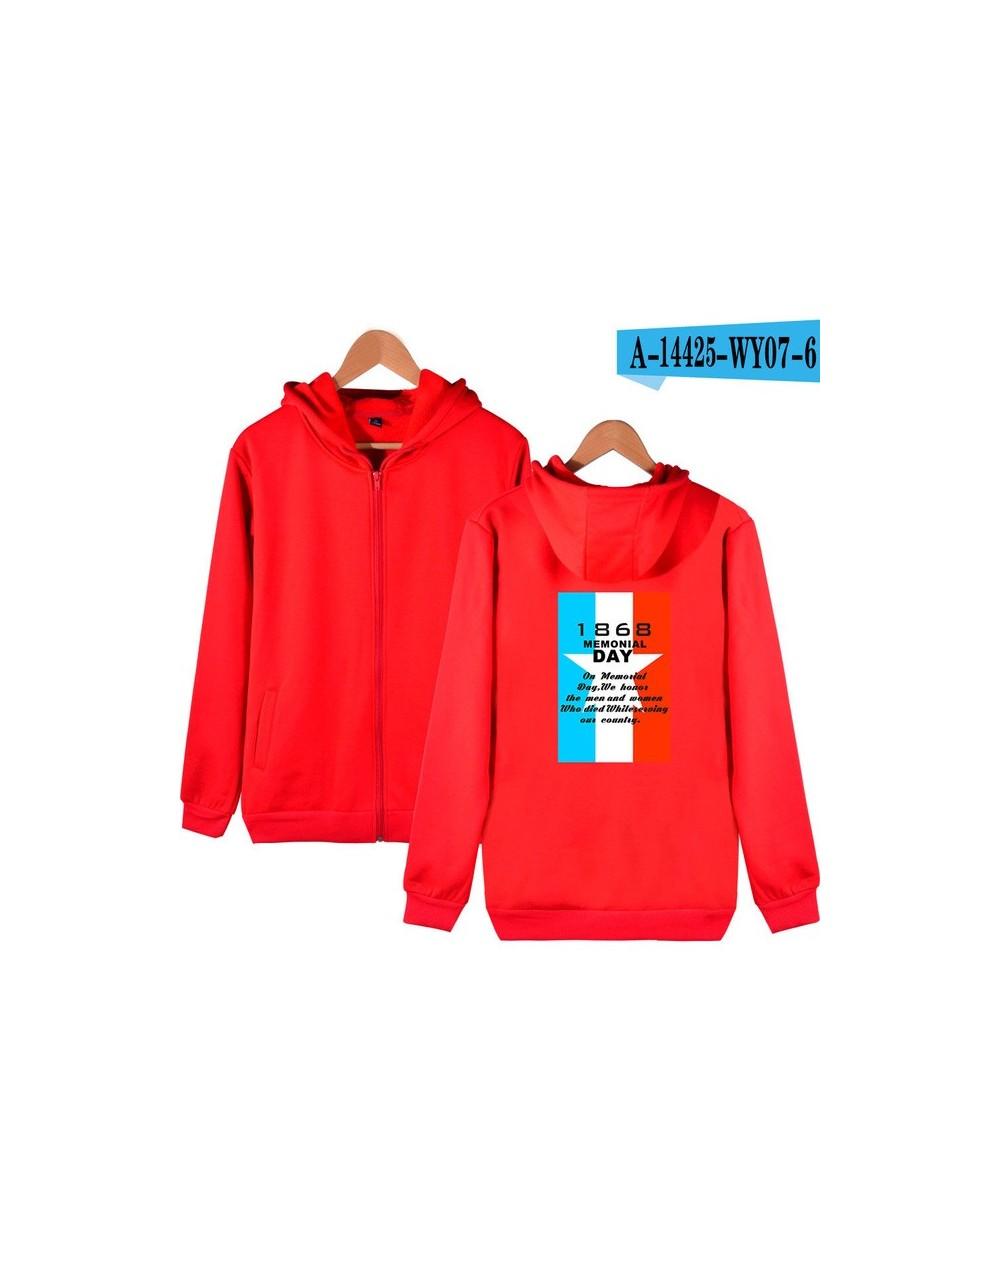 Memorial Day Hoodies Hot Sale Casual Zipper Hoodies Sweatshirts Harajuku Women and Men Clothes 2019 Popular K-pop Hooded Fas...